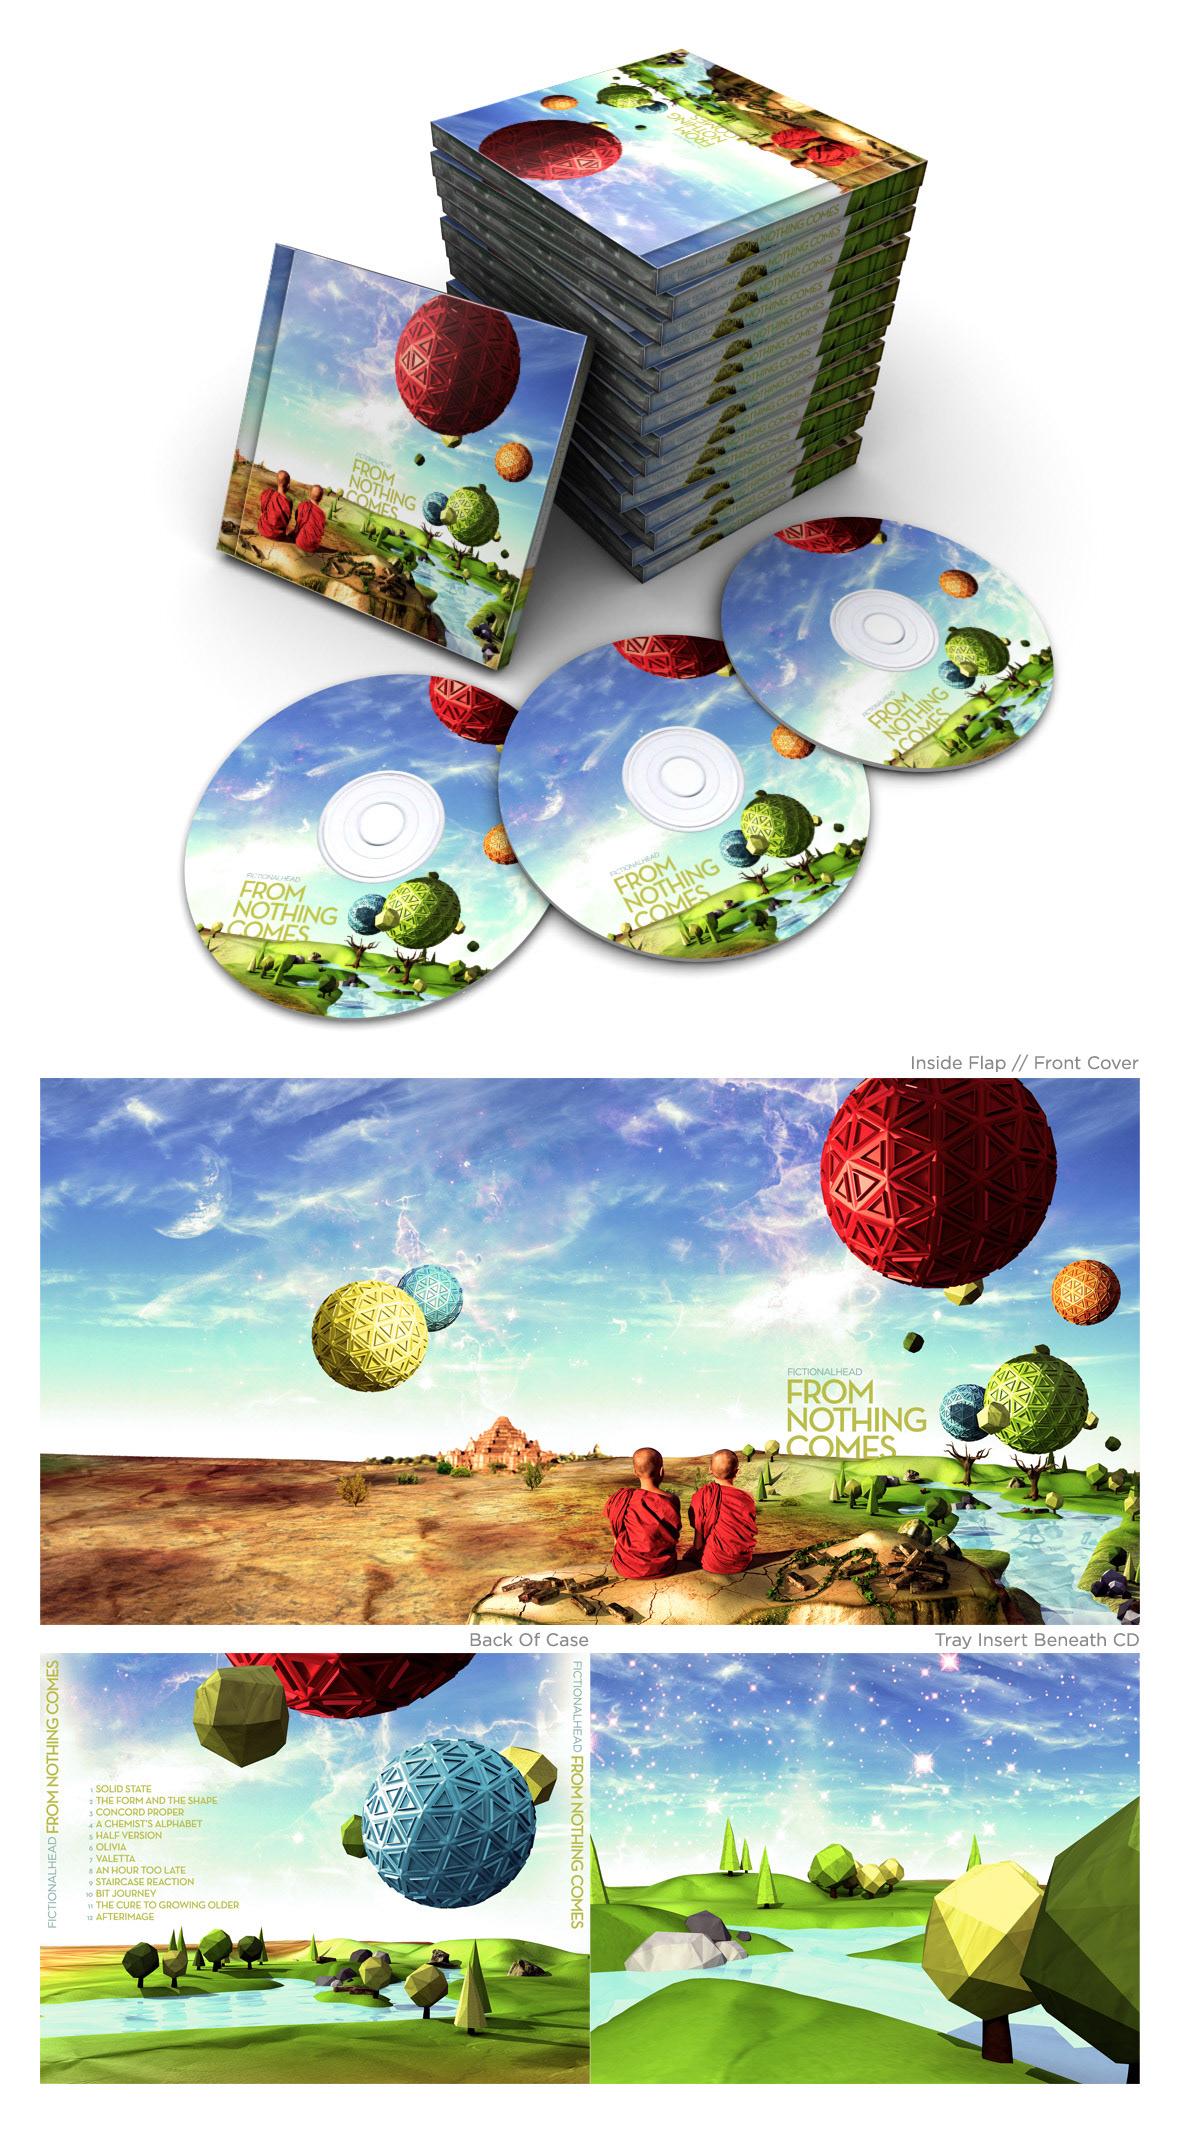 graphic design  art ILLUSTRATION  music 3D compositing photomanipulation